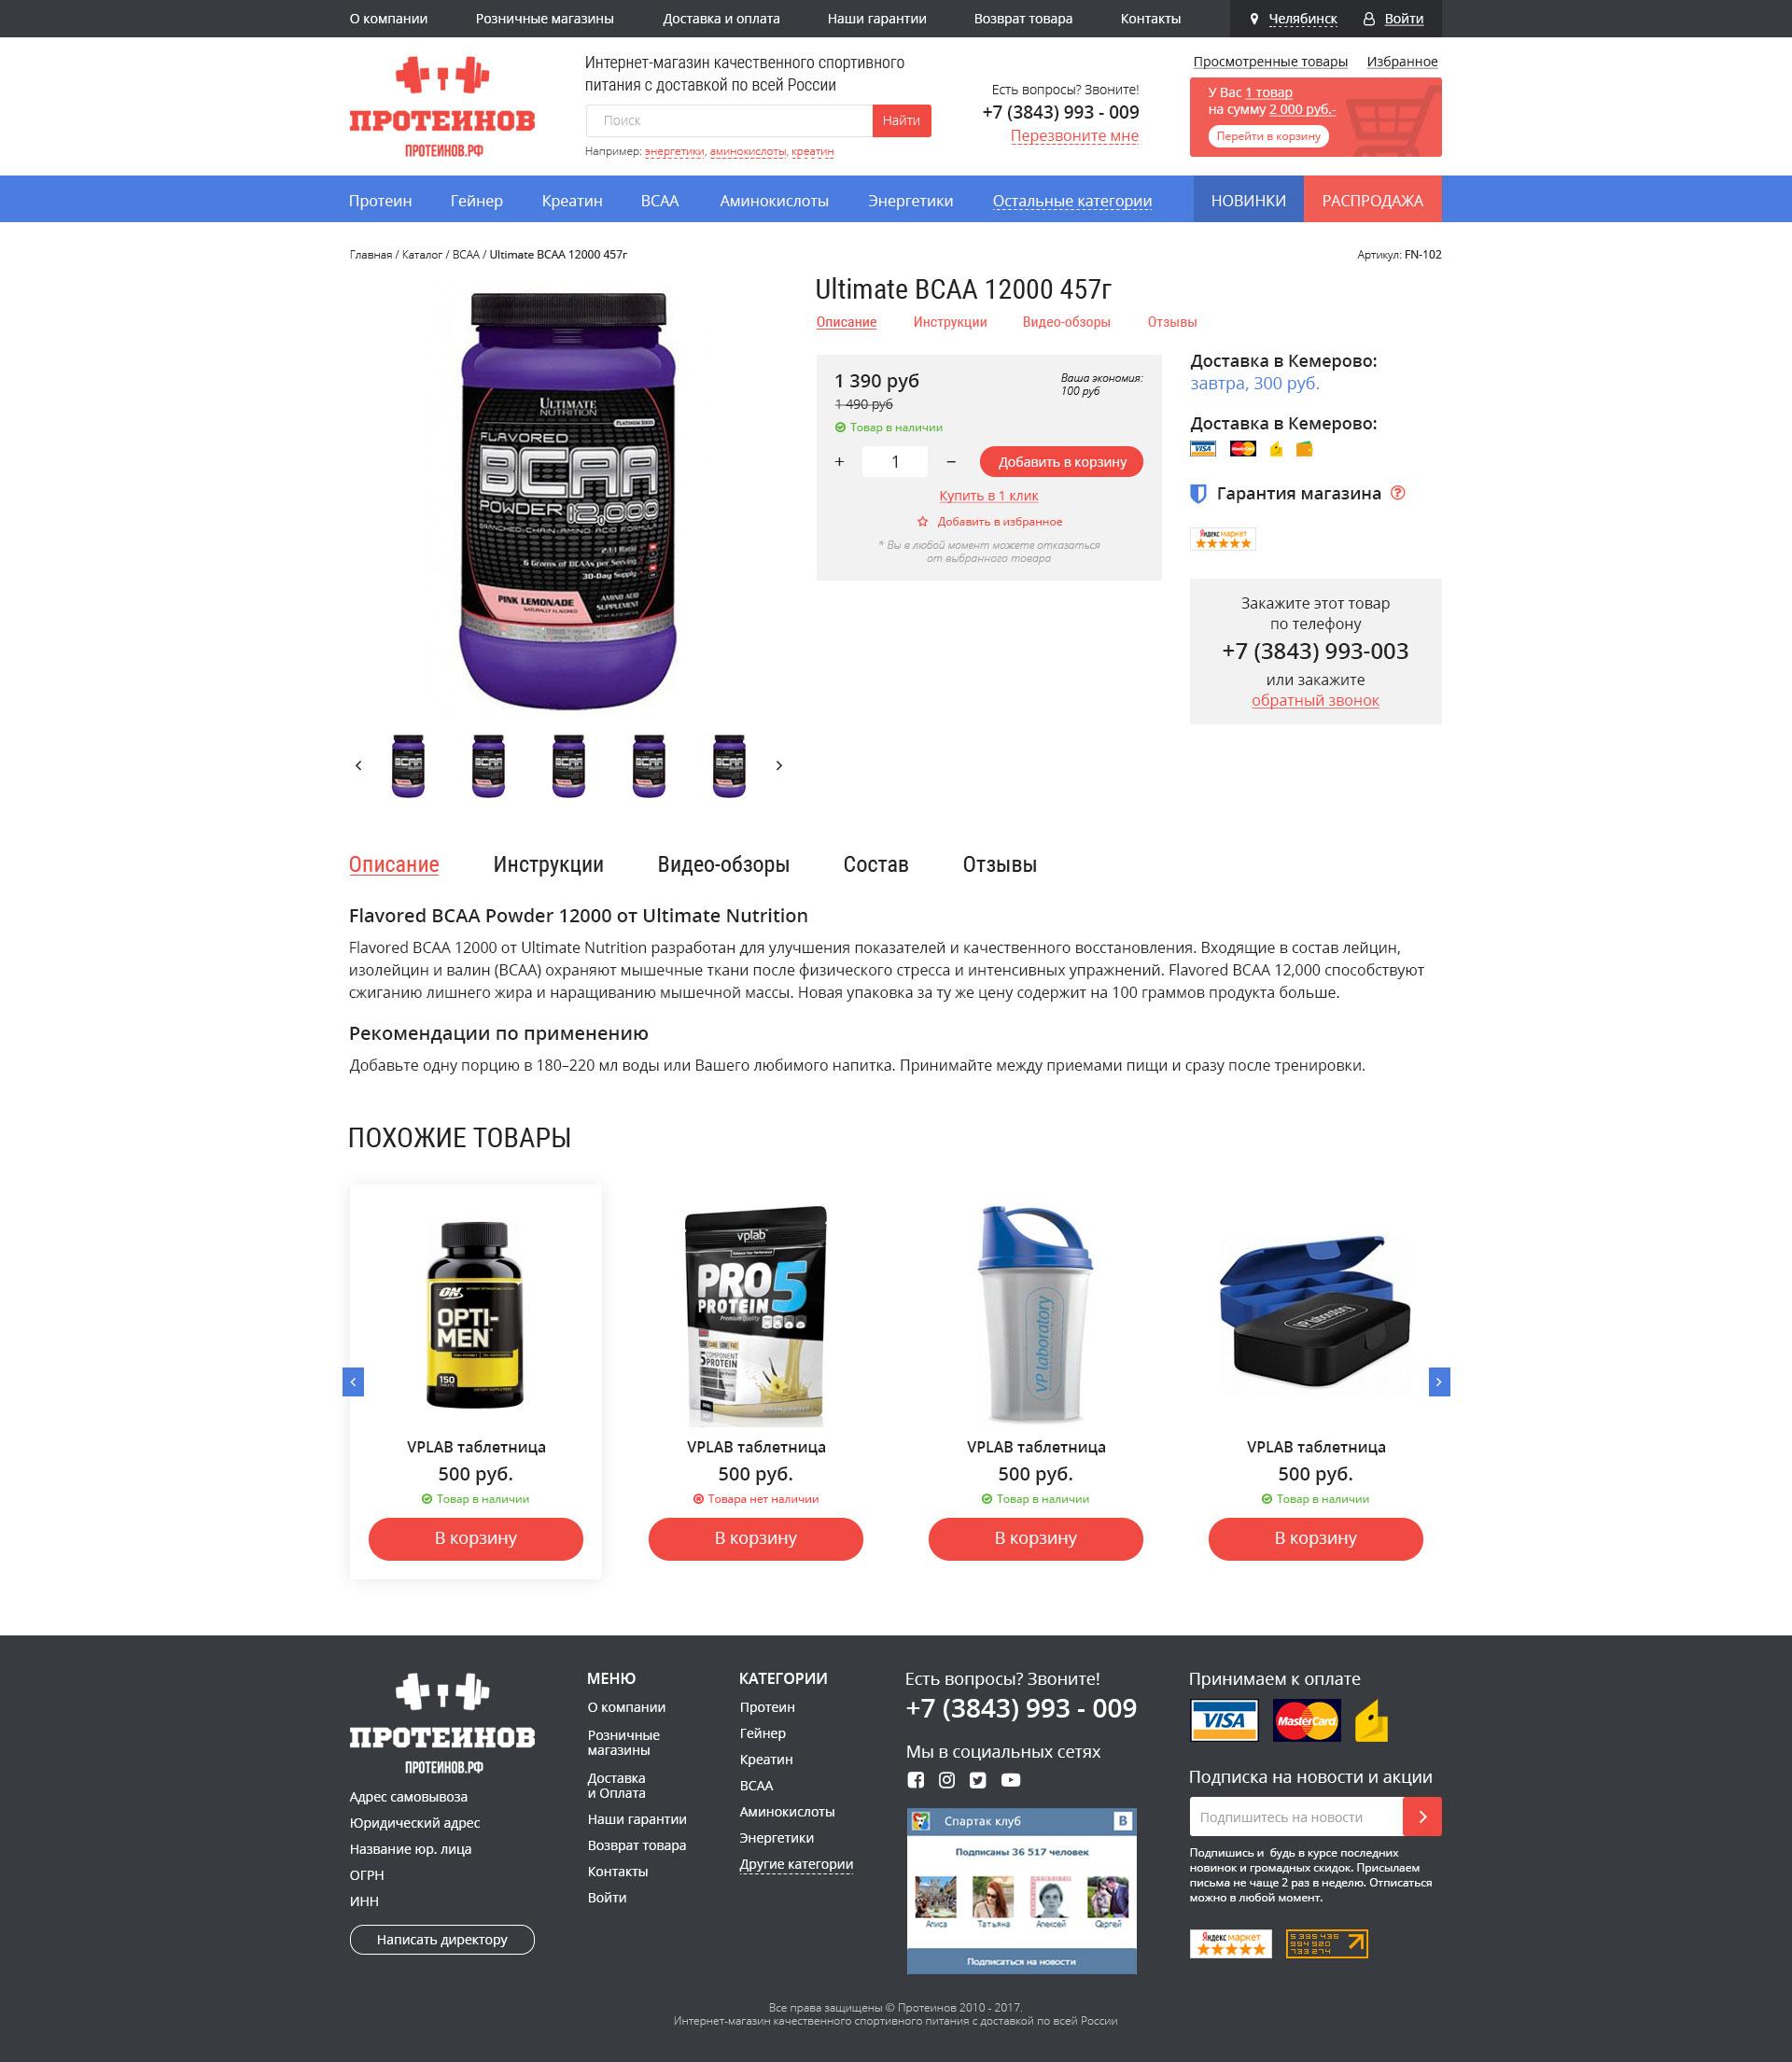 Дизайн интернет магазина по продаже протеинов